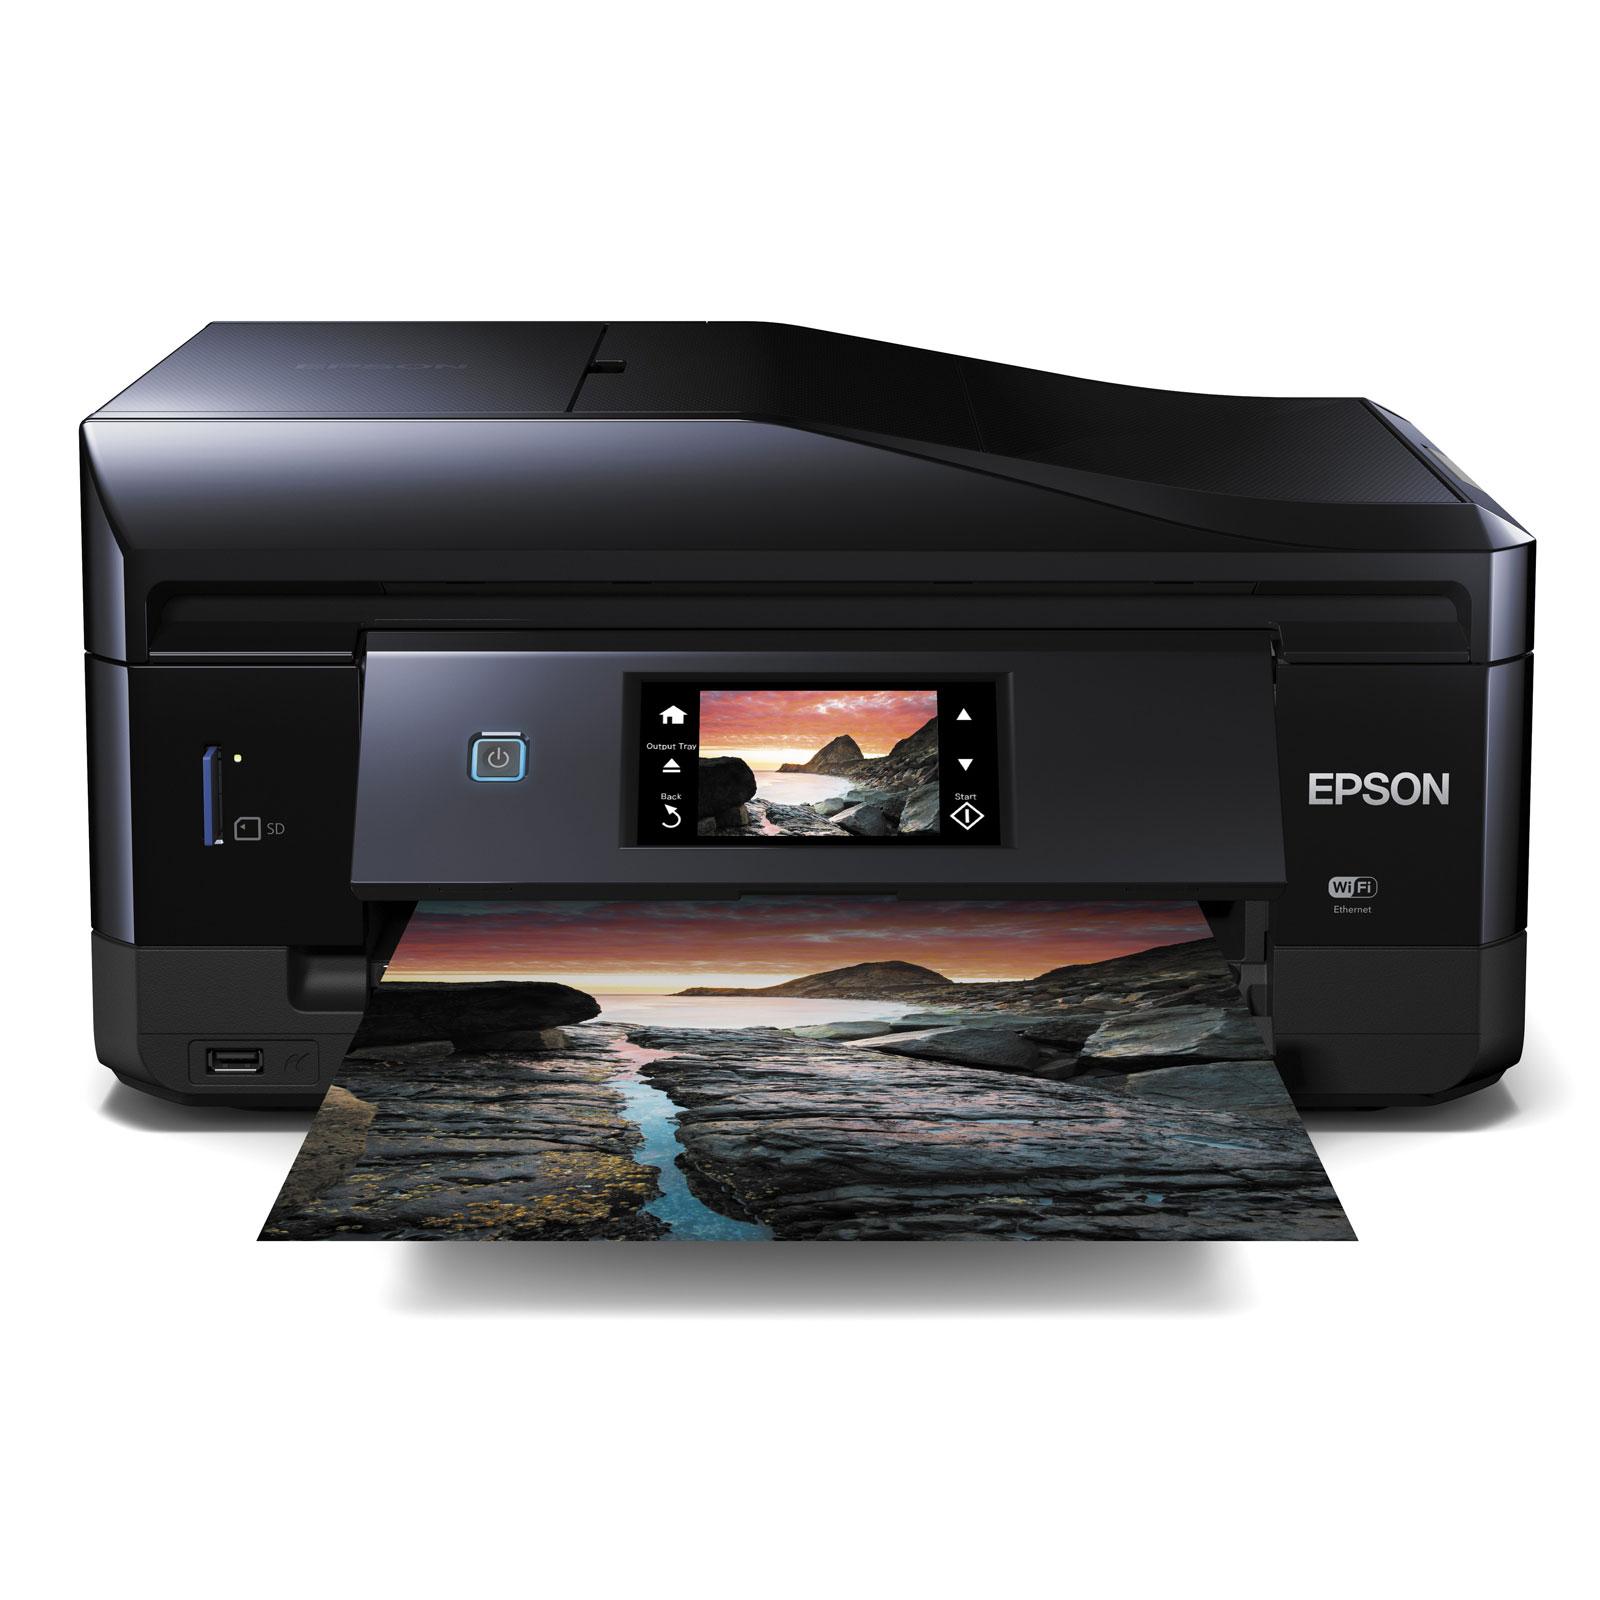 Imprimante multifonction Epson Expression Photo XP-860 Imprimante Multifonction jet d'encre 4-en-1 compatible Airprint et Cloud Print (USB / Wi-Fi N / Ethernet )